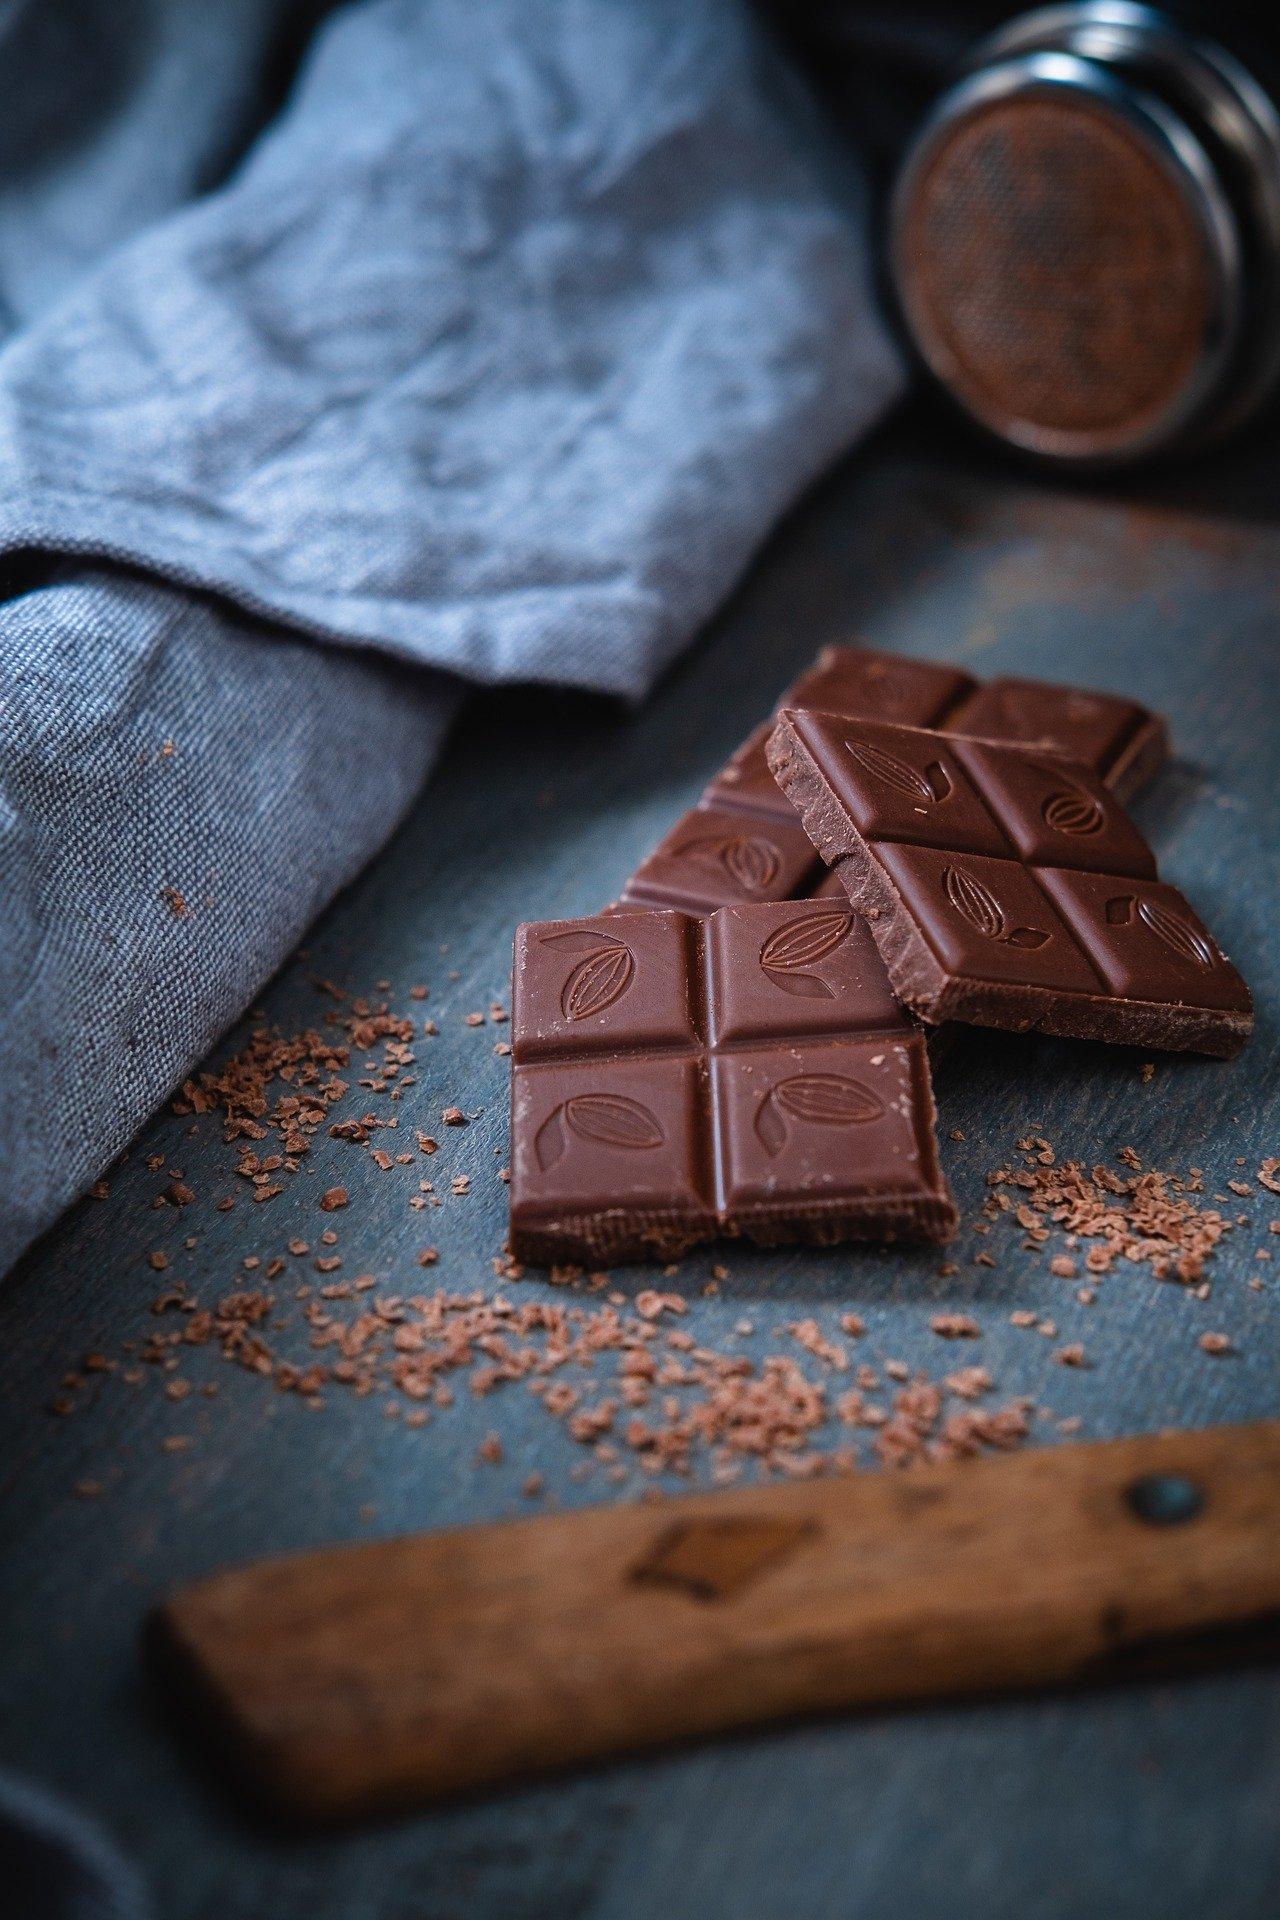 chocolate 1280x1920 - Free image bank